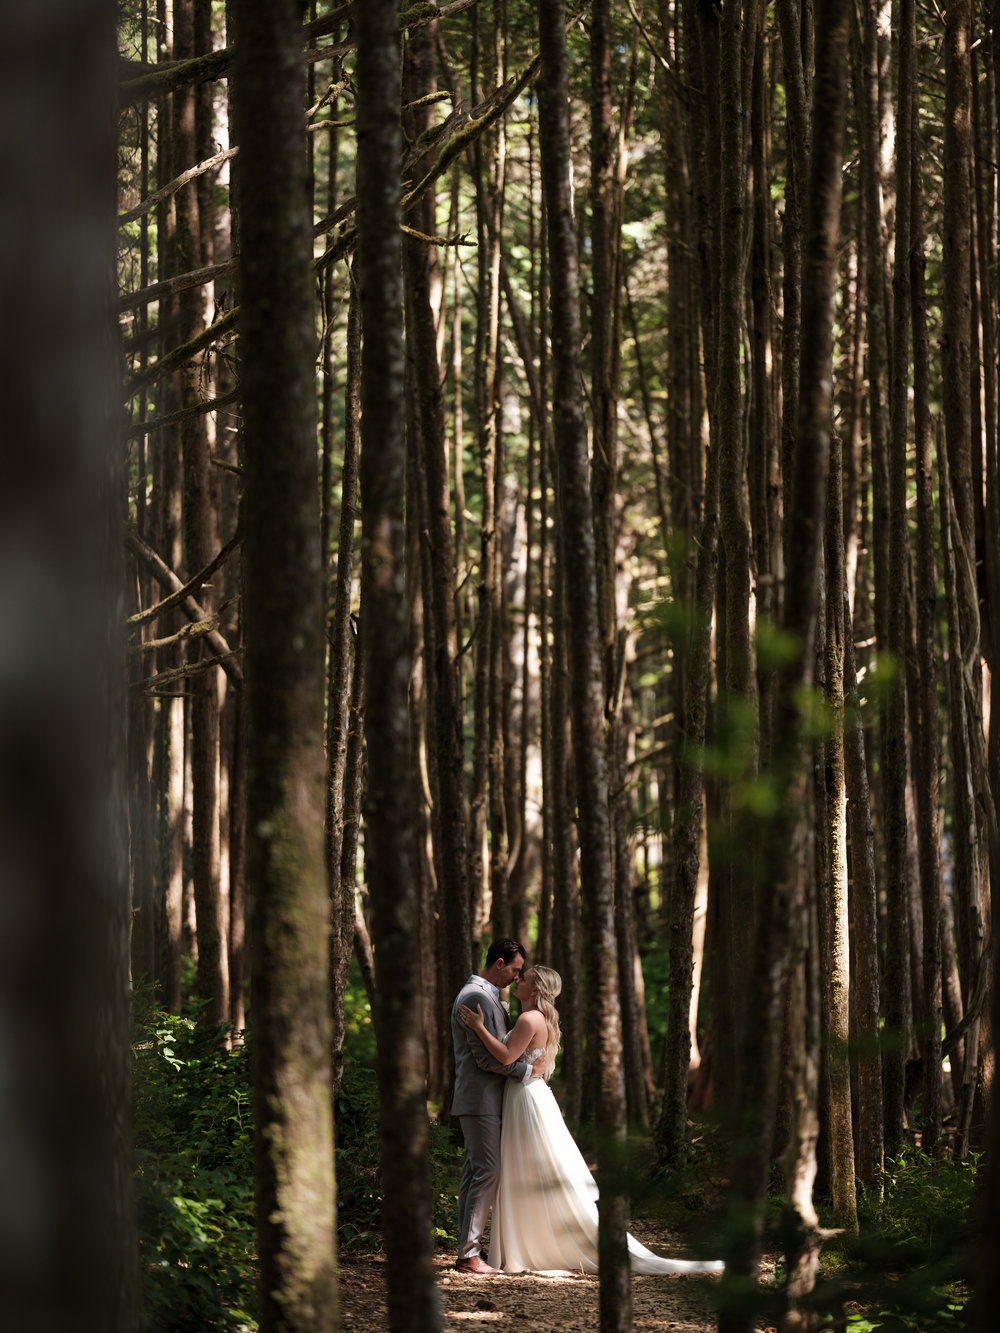 tofino ucluelet wedding engagement photographer photography PLP_18_07_AllisonSean-75.jpg